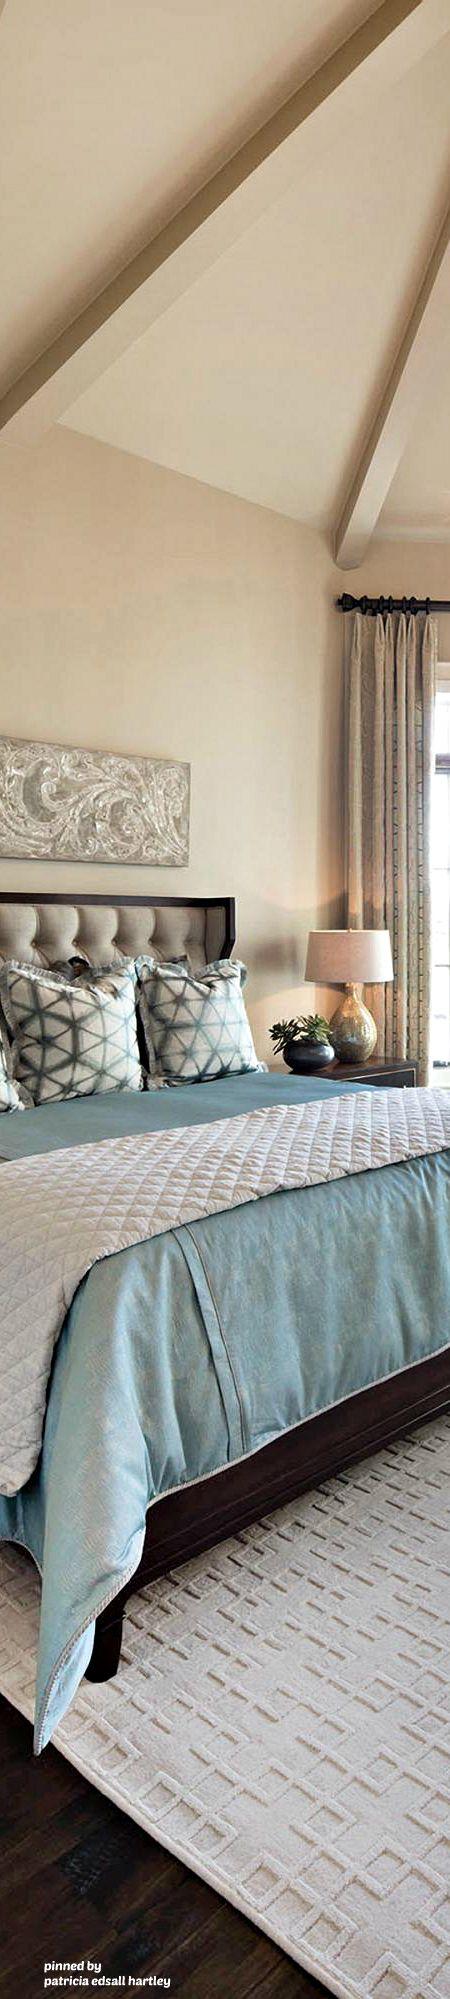 Best 458 Best Beautiful Master Bedrooms Images On Pinterest 640 x 480